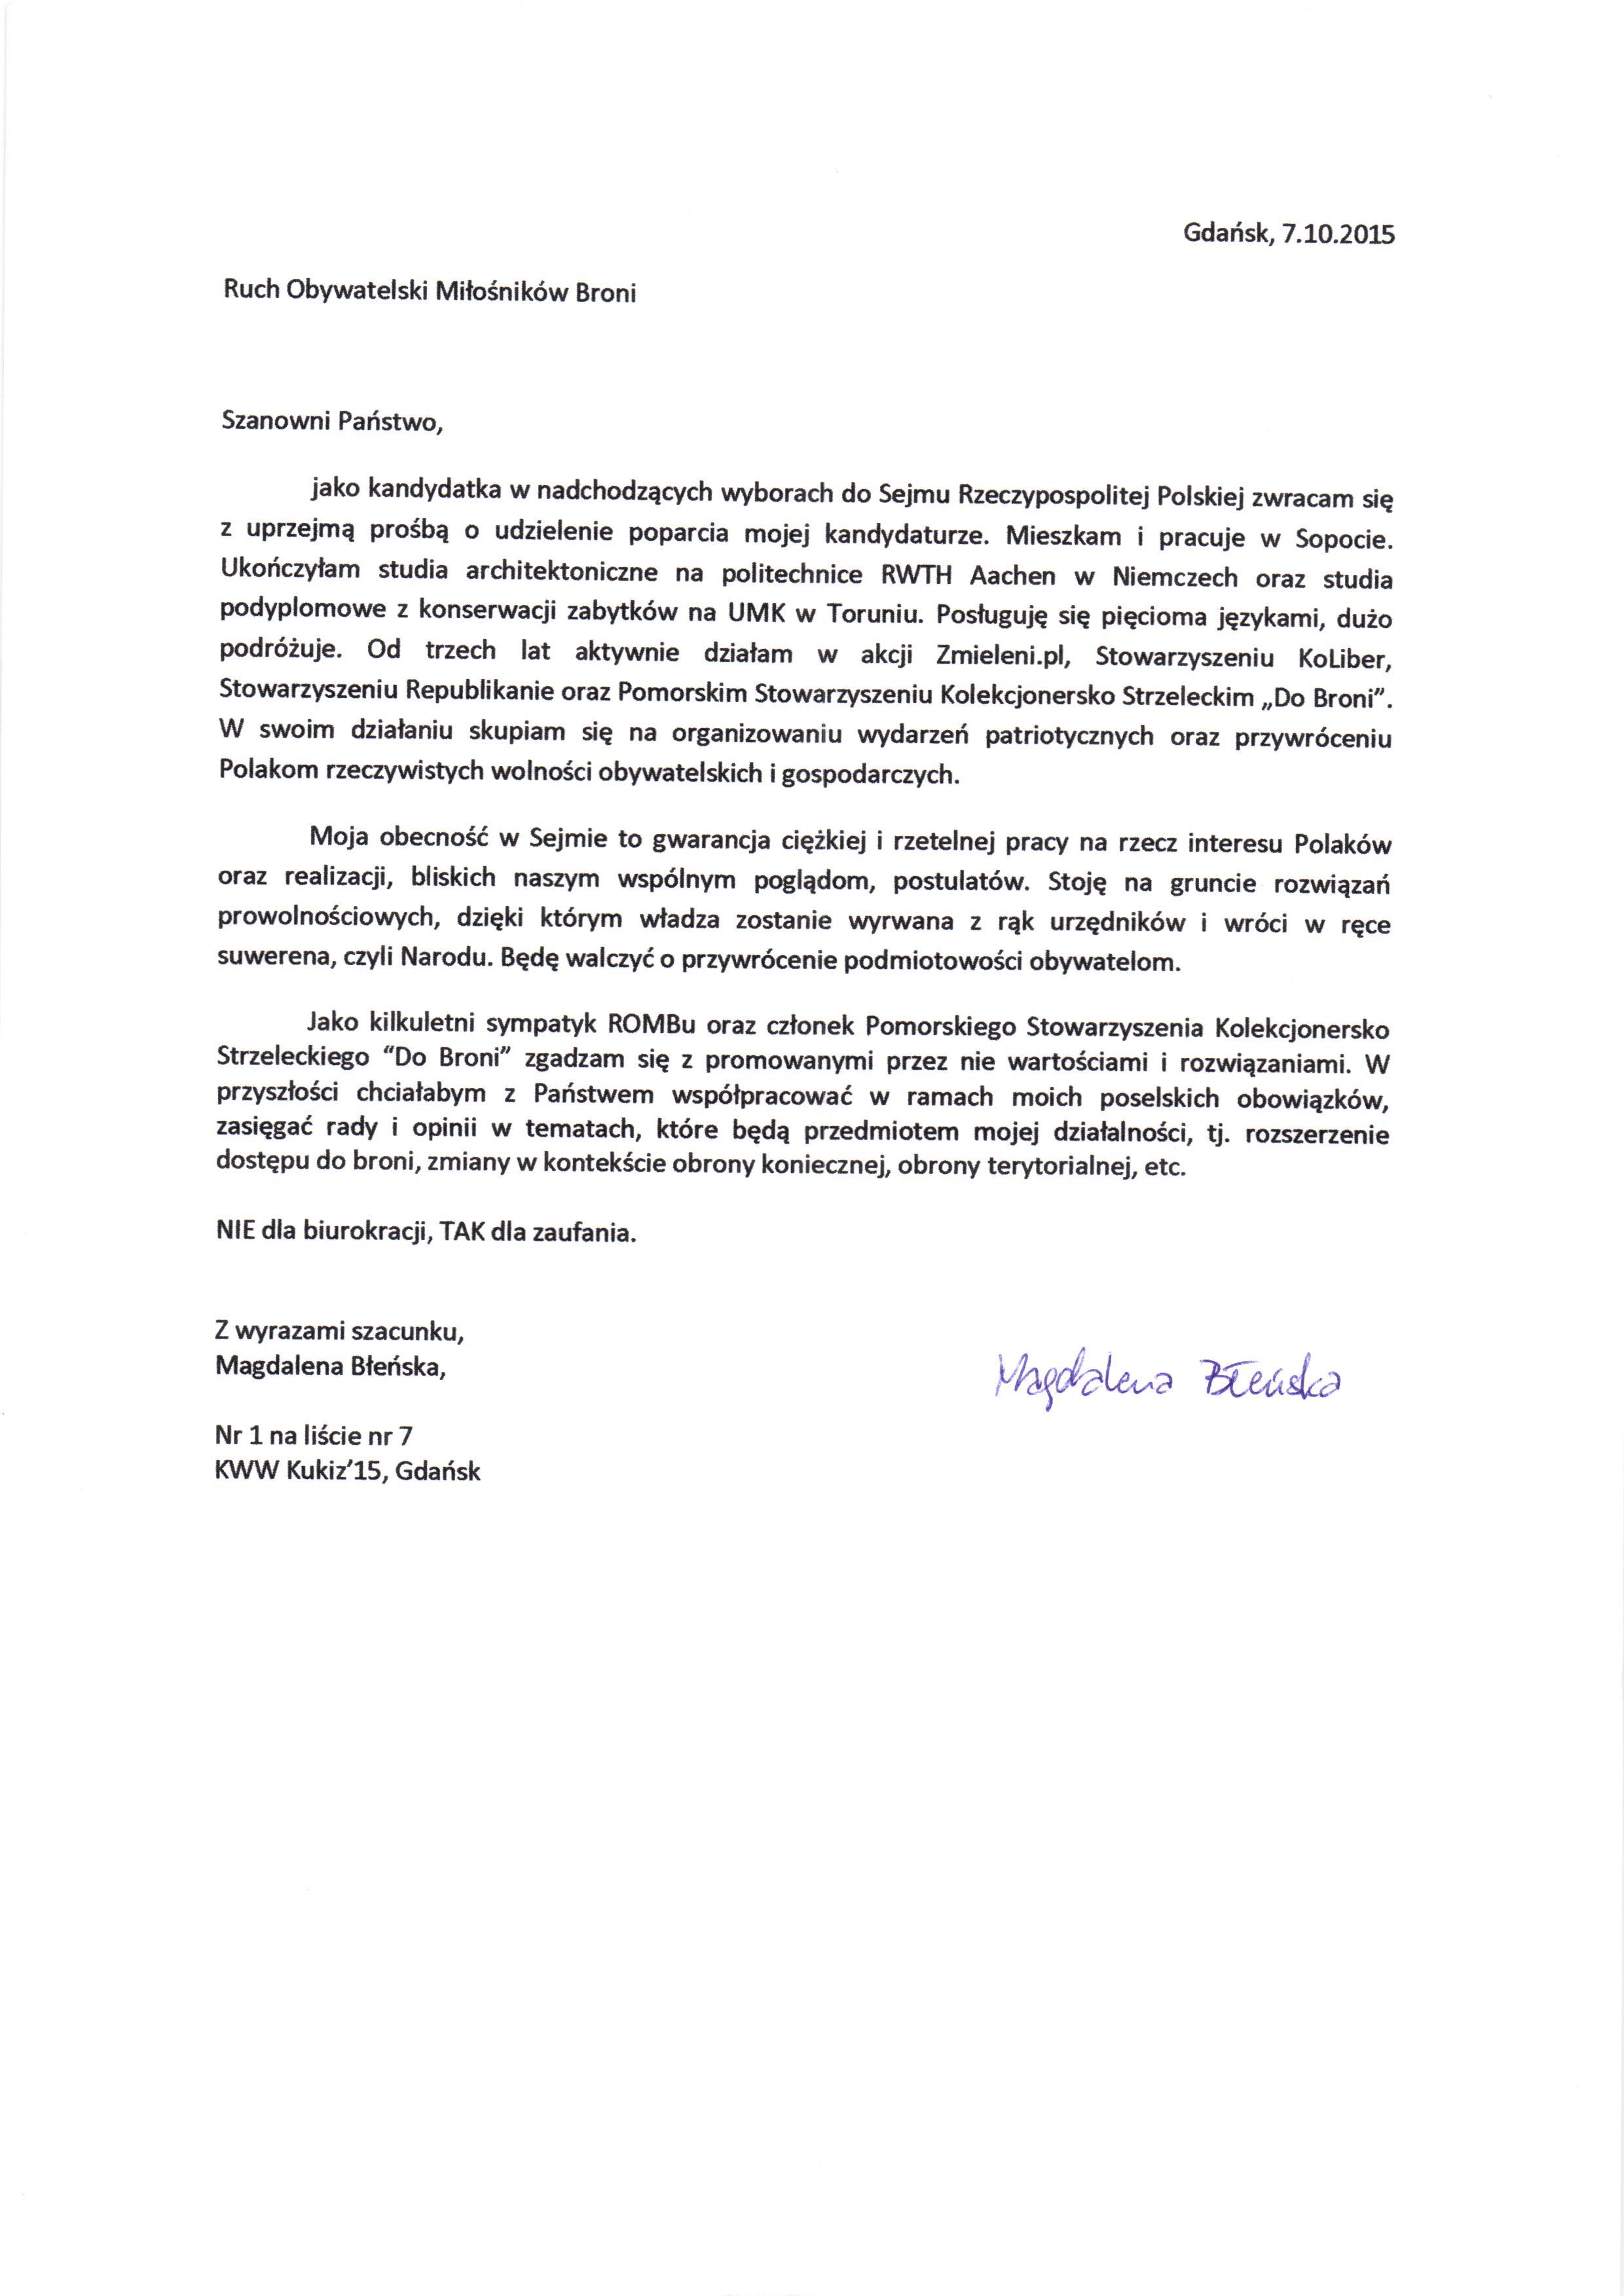 pismoBLENSKA71015